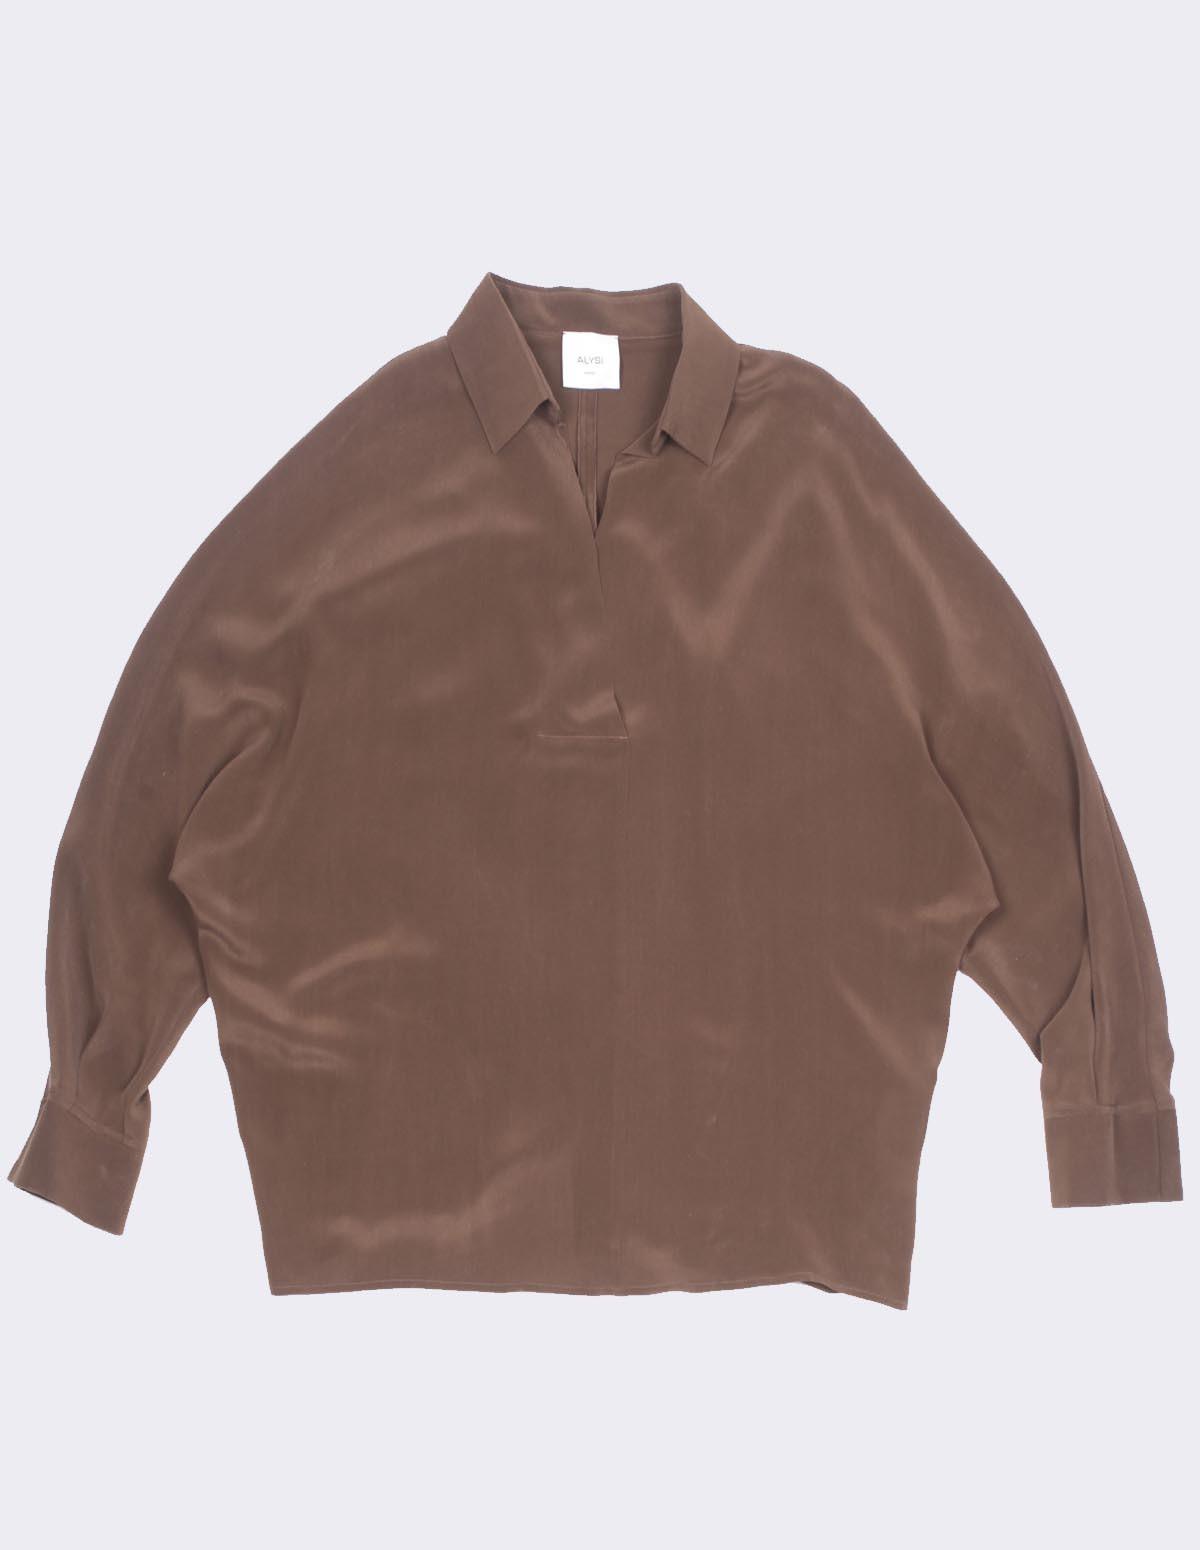 Alysi 150205 Shirt - SIGARO